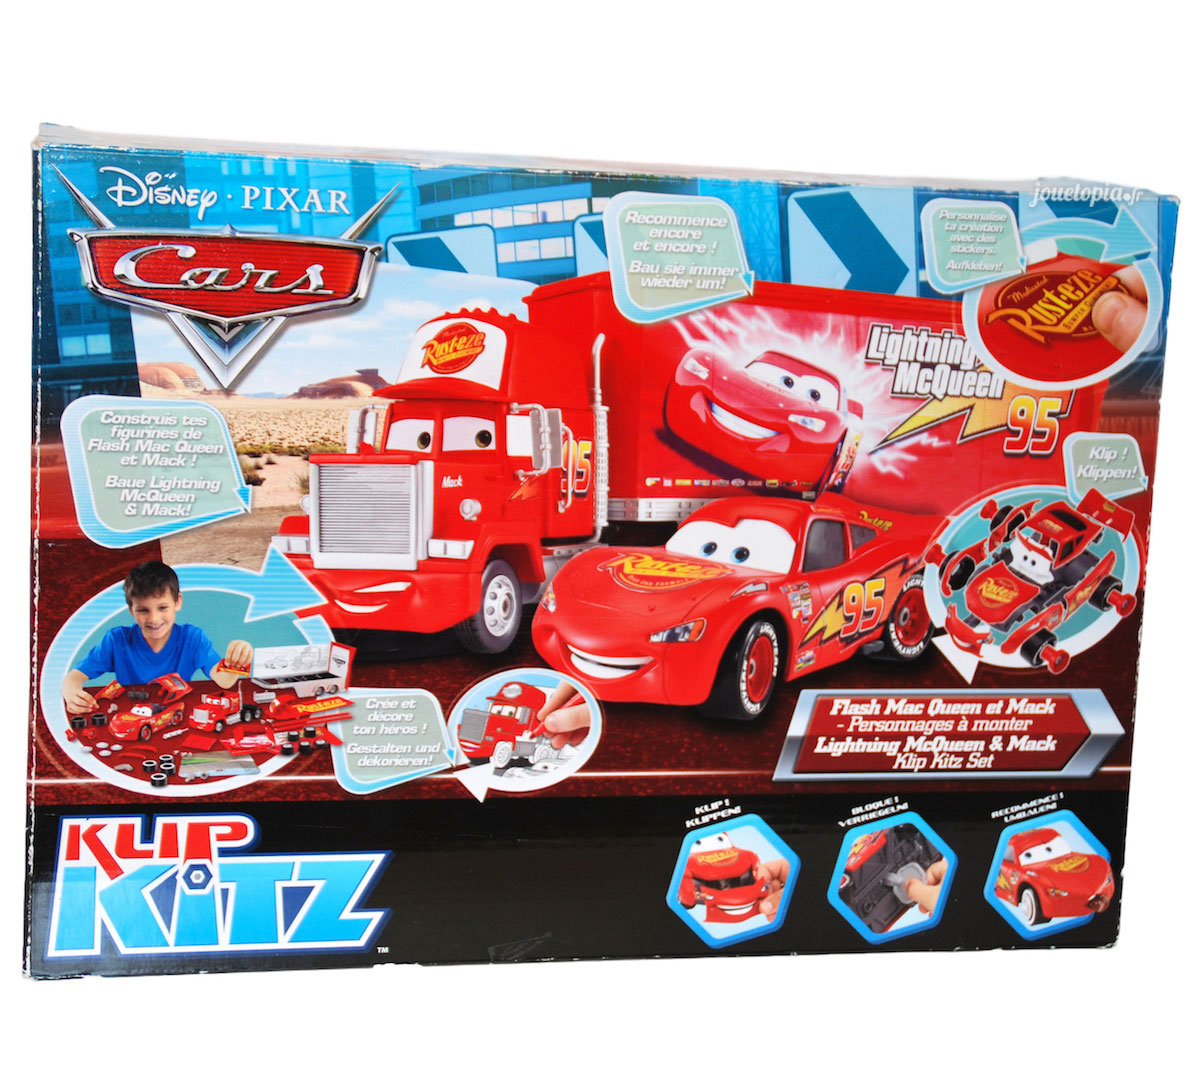 Coloriage Camion Mack.Klip Kitz Cars Flash Mcqueen Camion Mack Disney Pixar